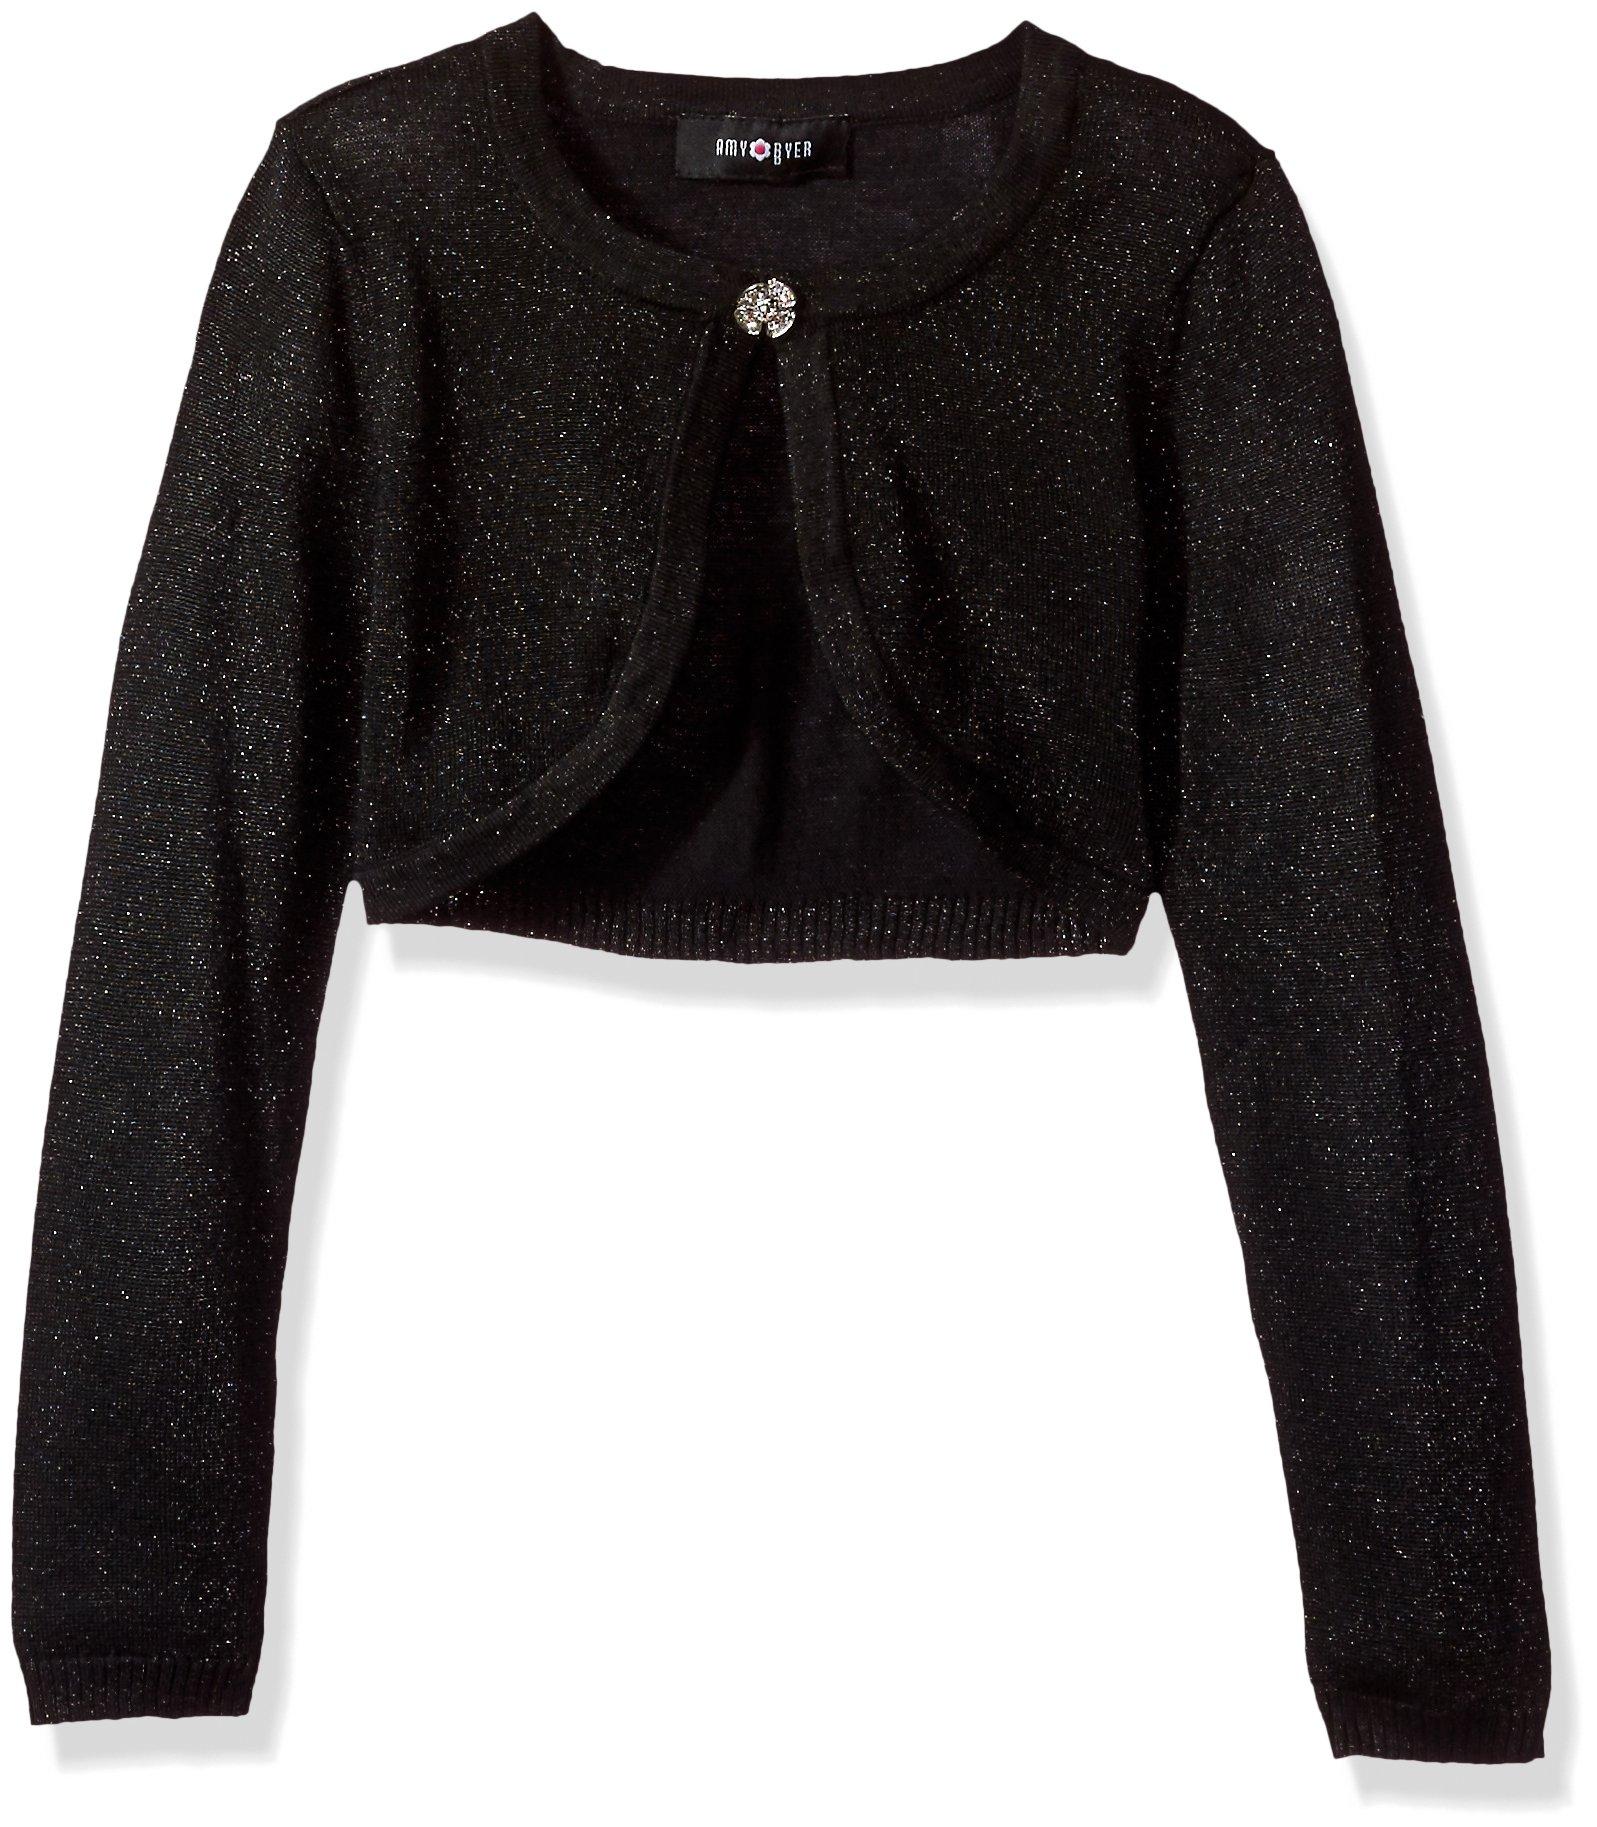 Amy Byer Big Girls' Long Sleeve Metallic Cardigan, Black, M